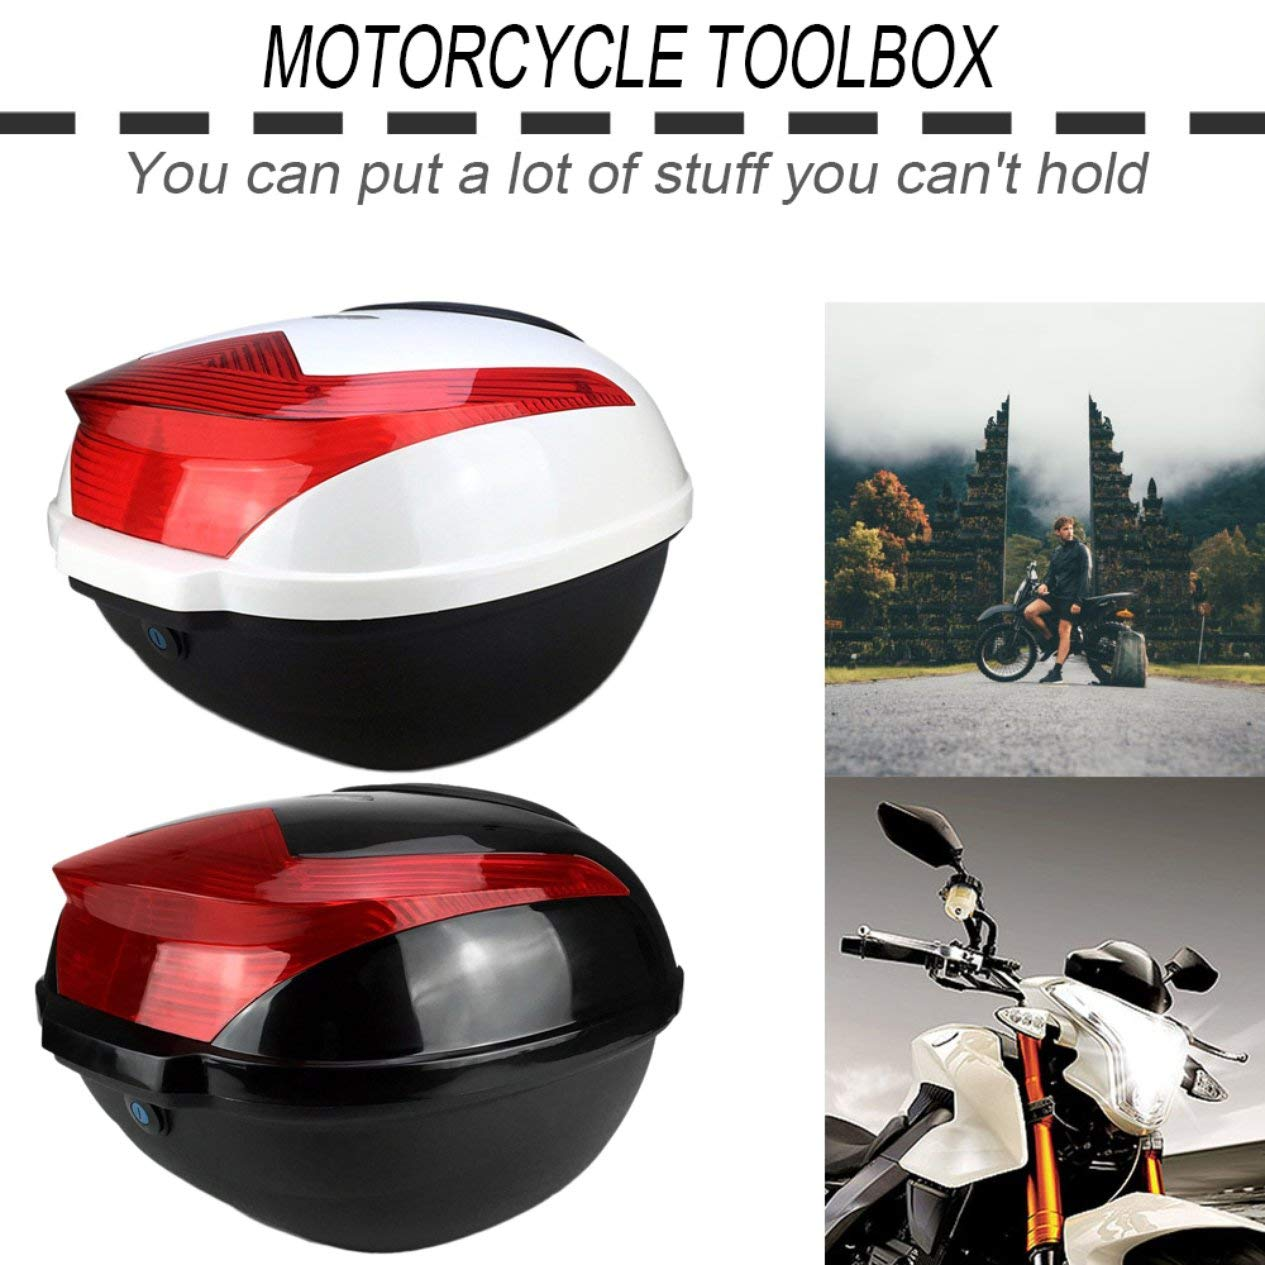 EdBerk74 Grande capacit/é antichoc moto box of bike box universel avec top lock